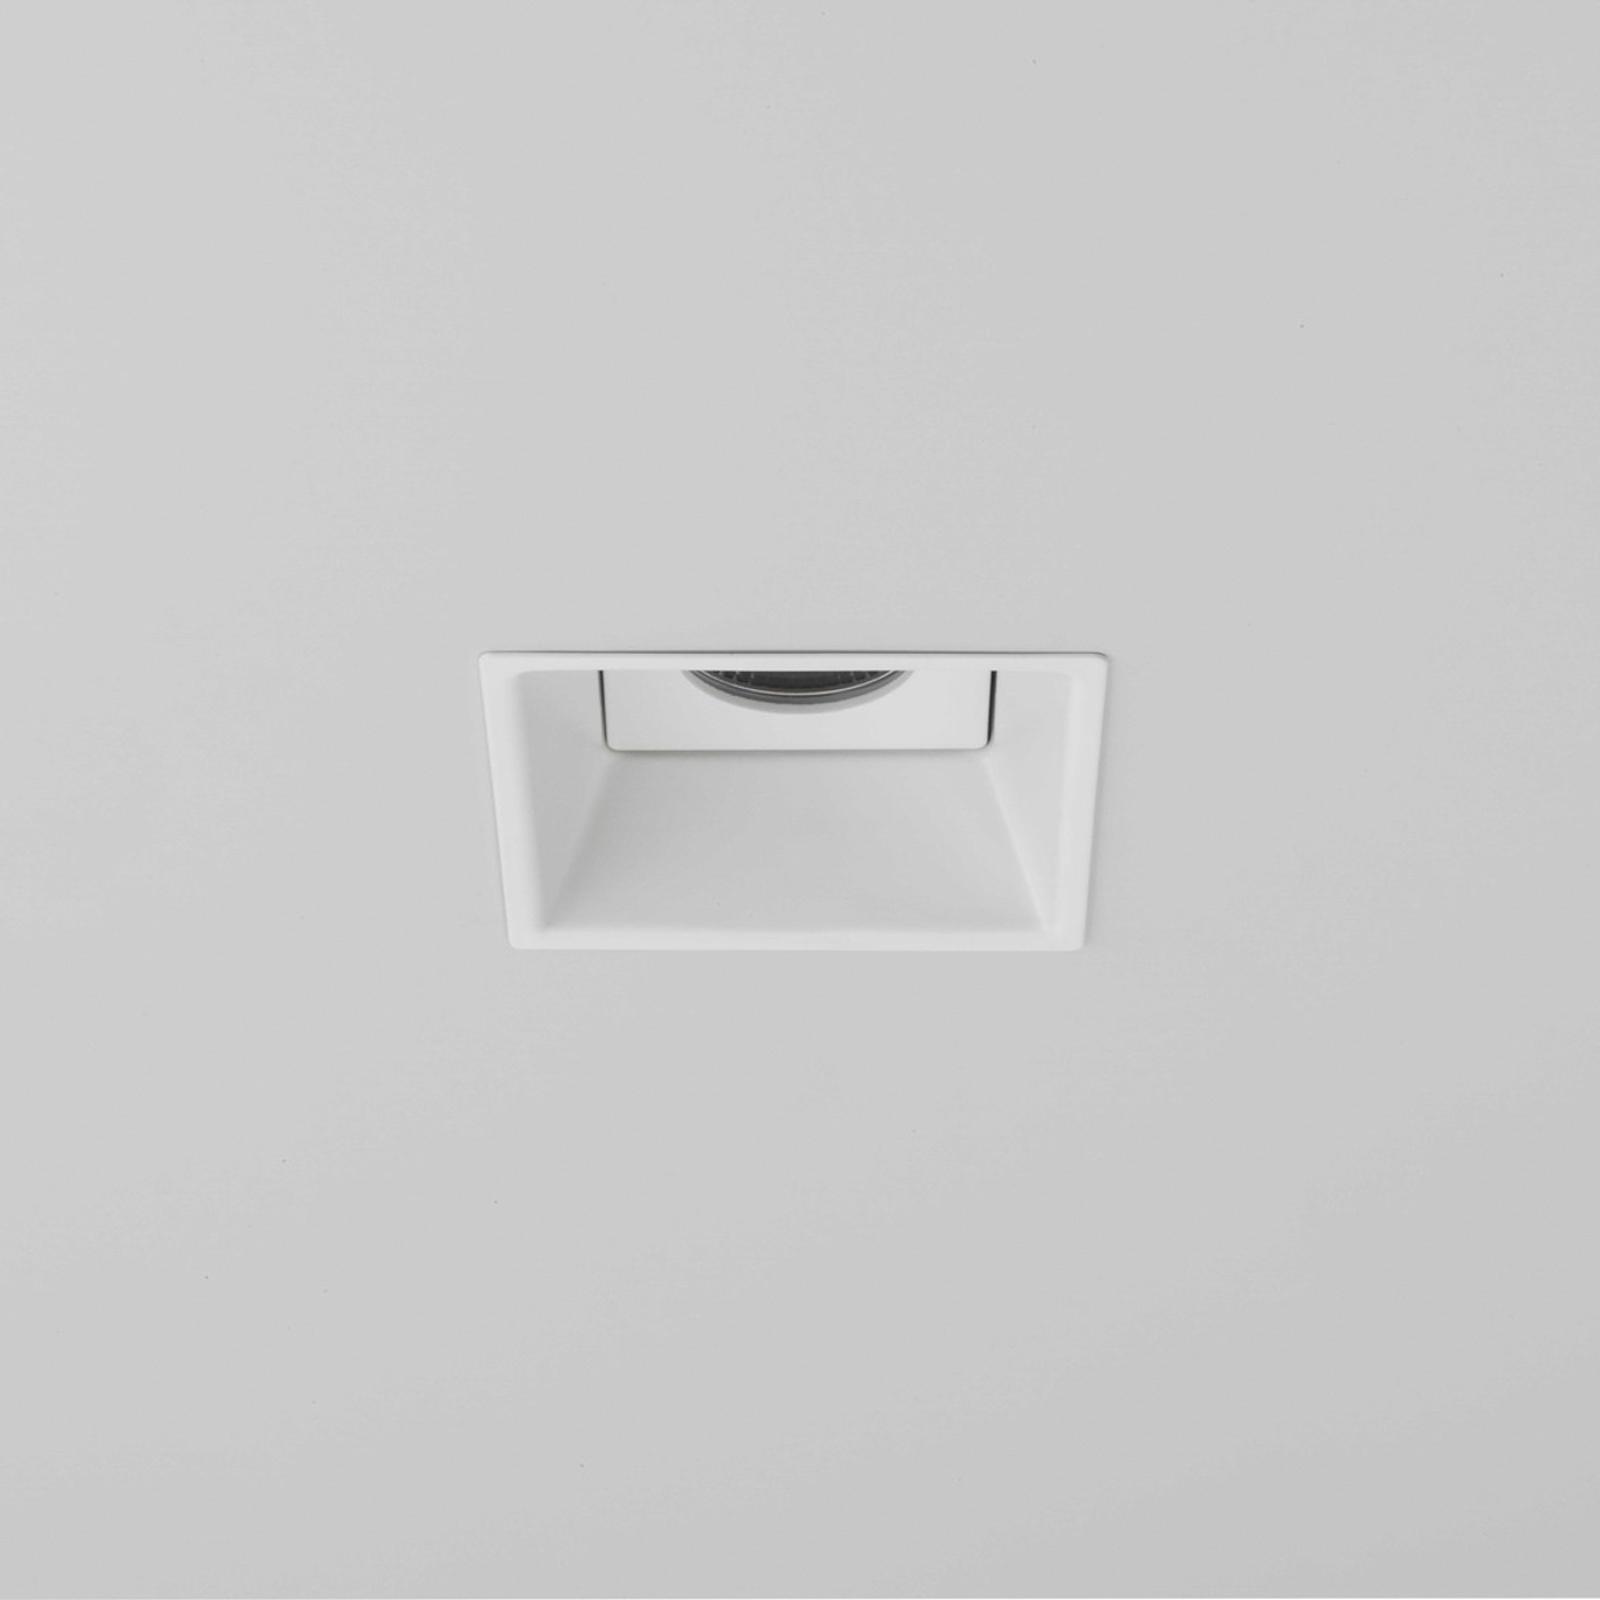 Astro Minima Square LED-Einbaustrahler, IP65, weiß